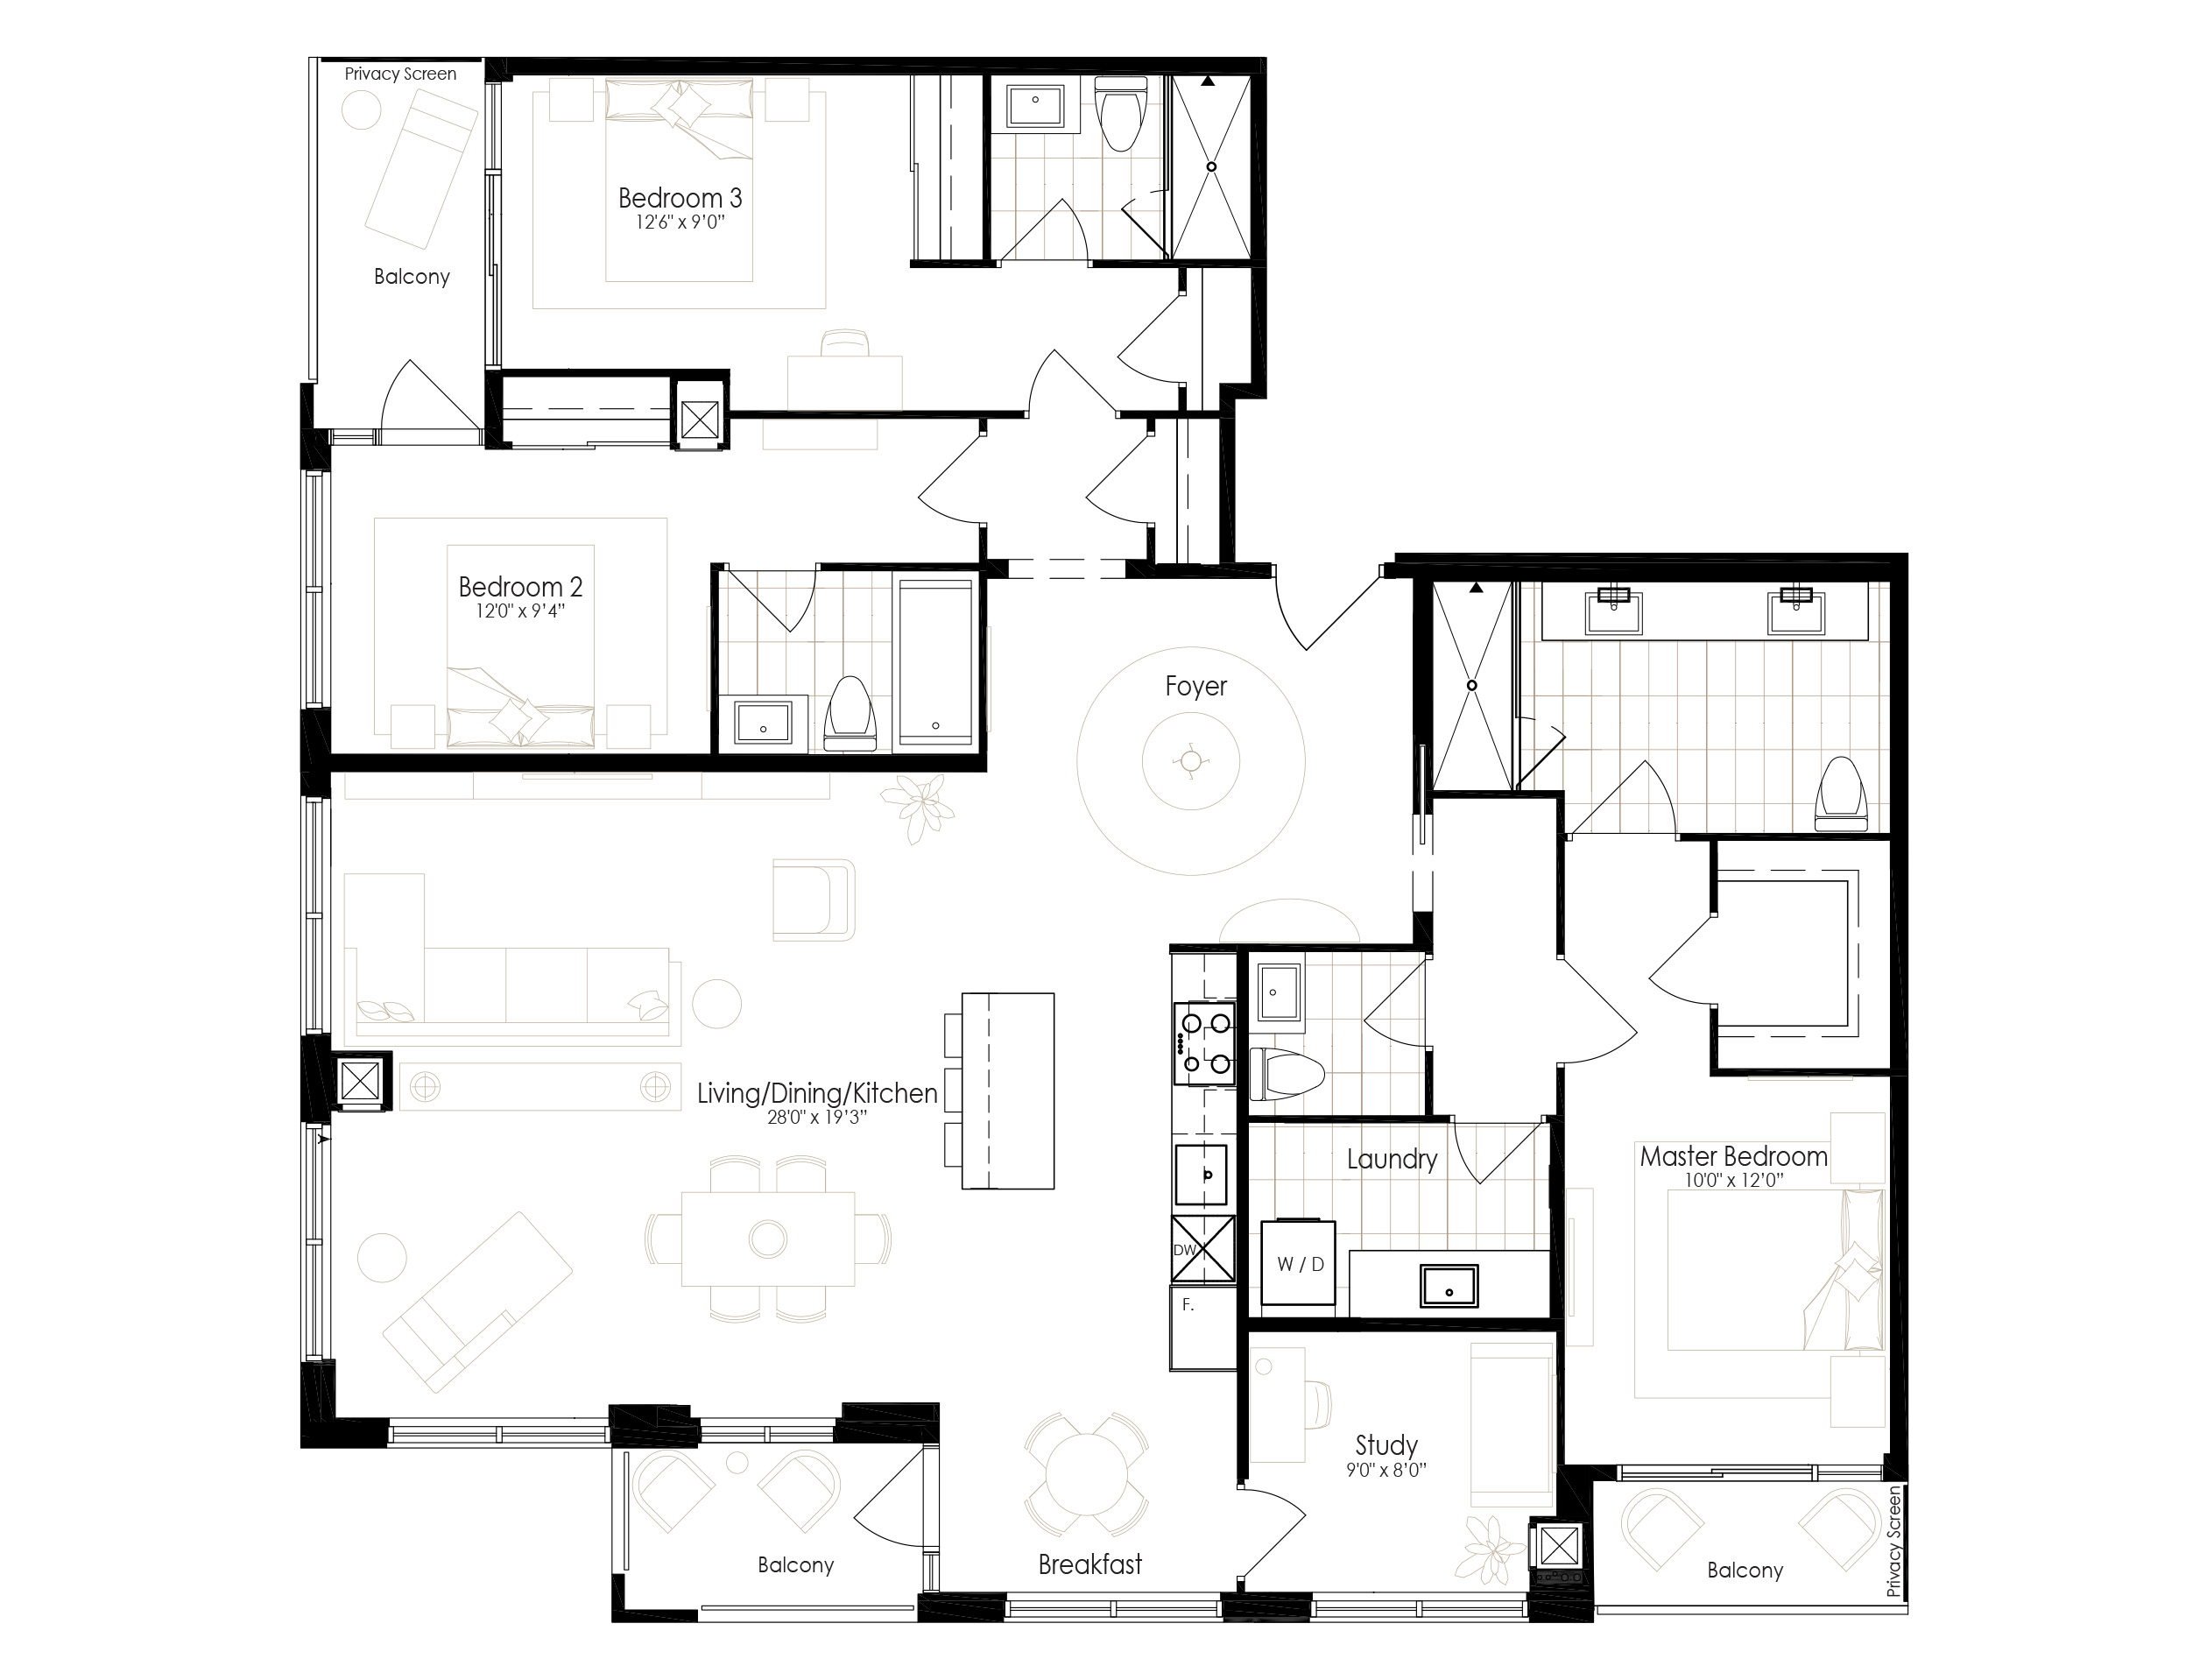 oro-condos-penthouse-onyx-floorplan-square-one